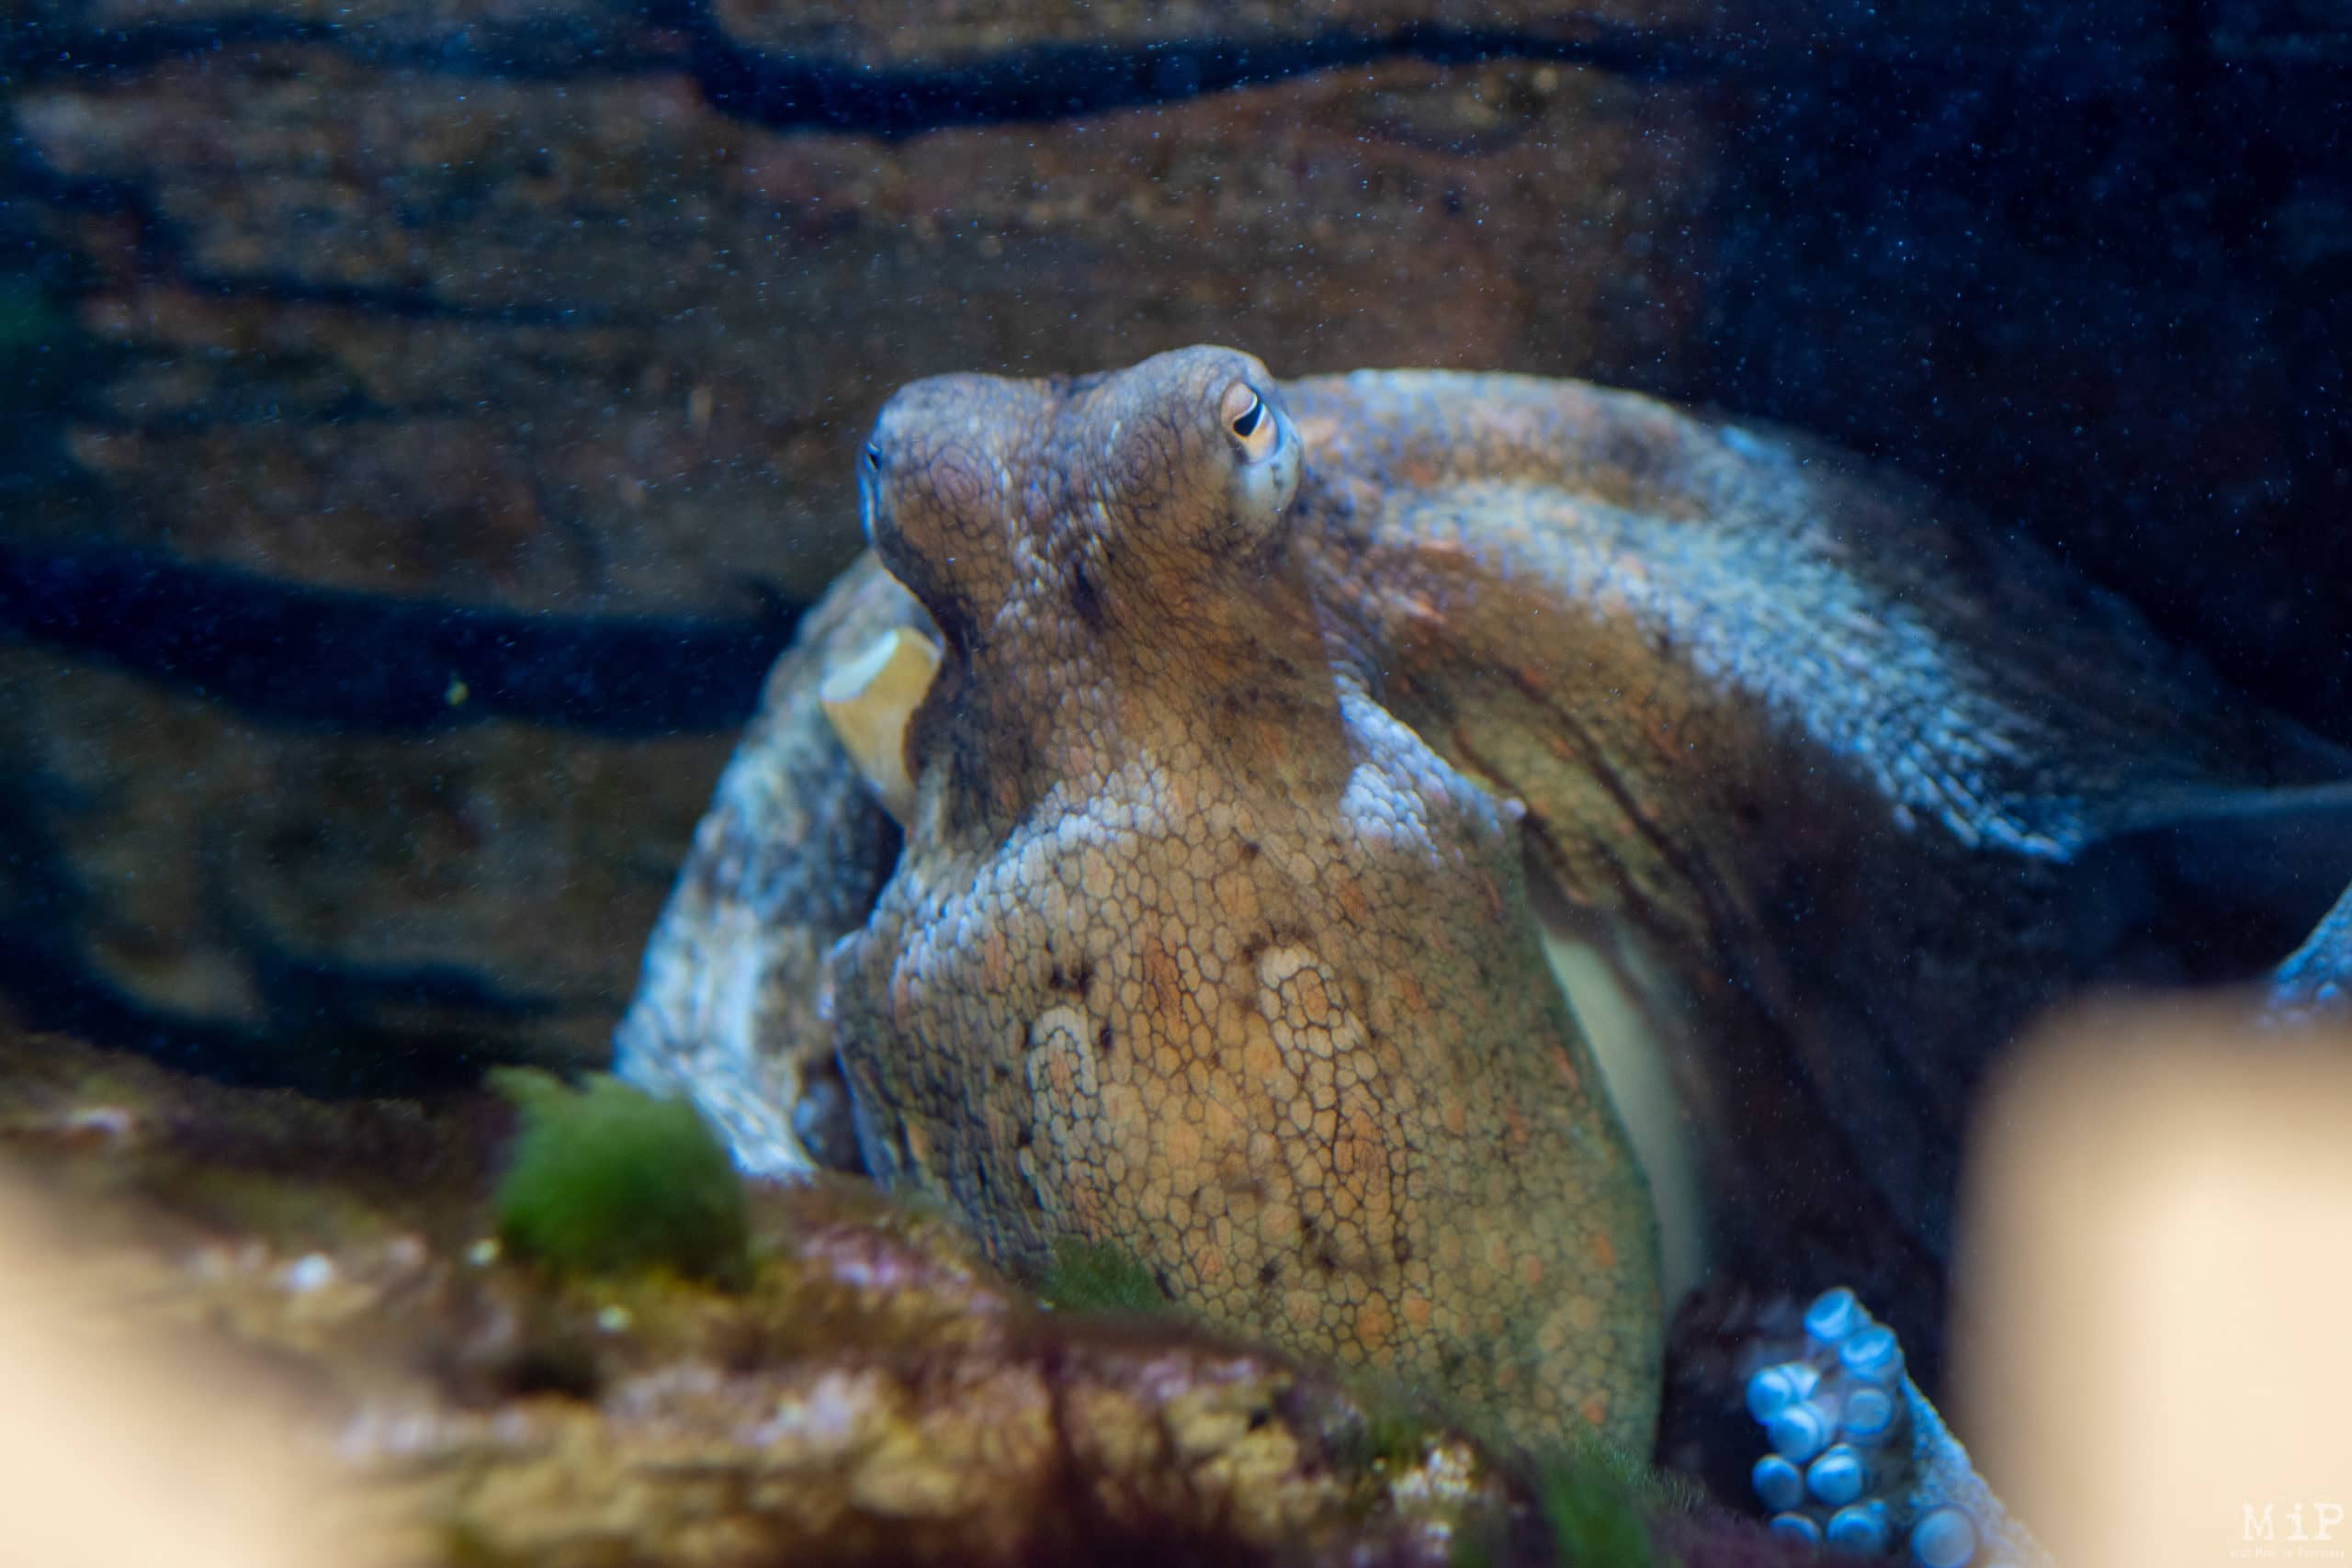 Oniria - Aquarium de Canet-en-Roussillon © Arnaud Le Vu / MiP / HL